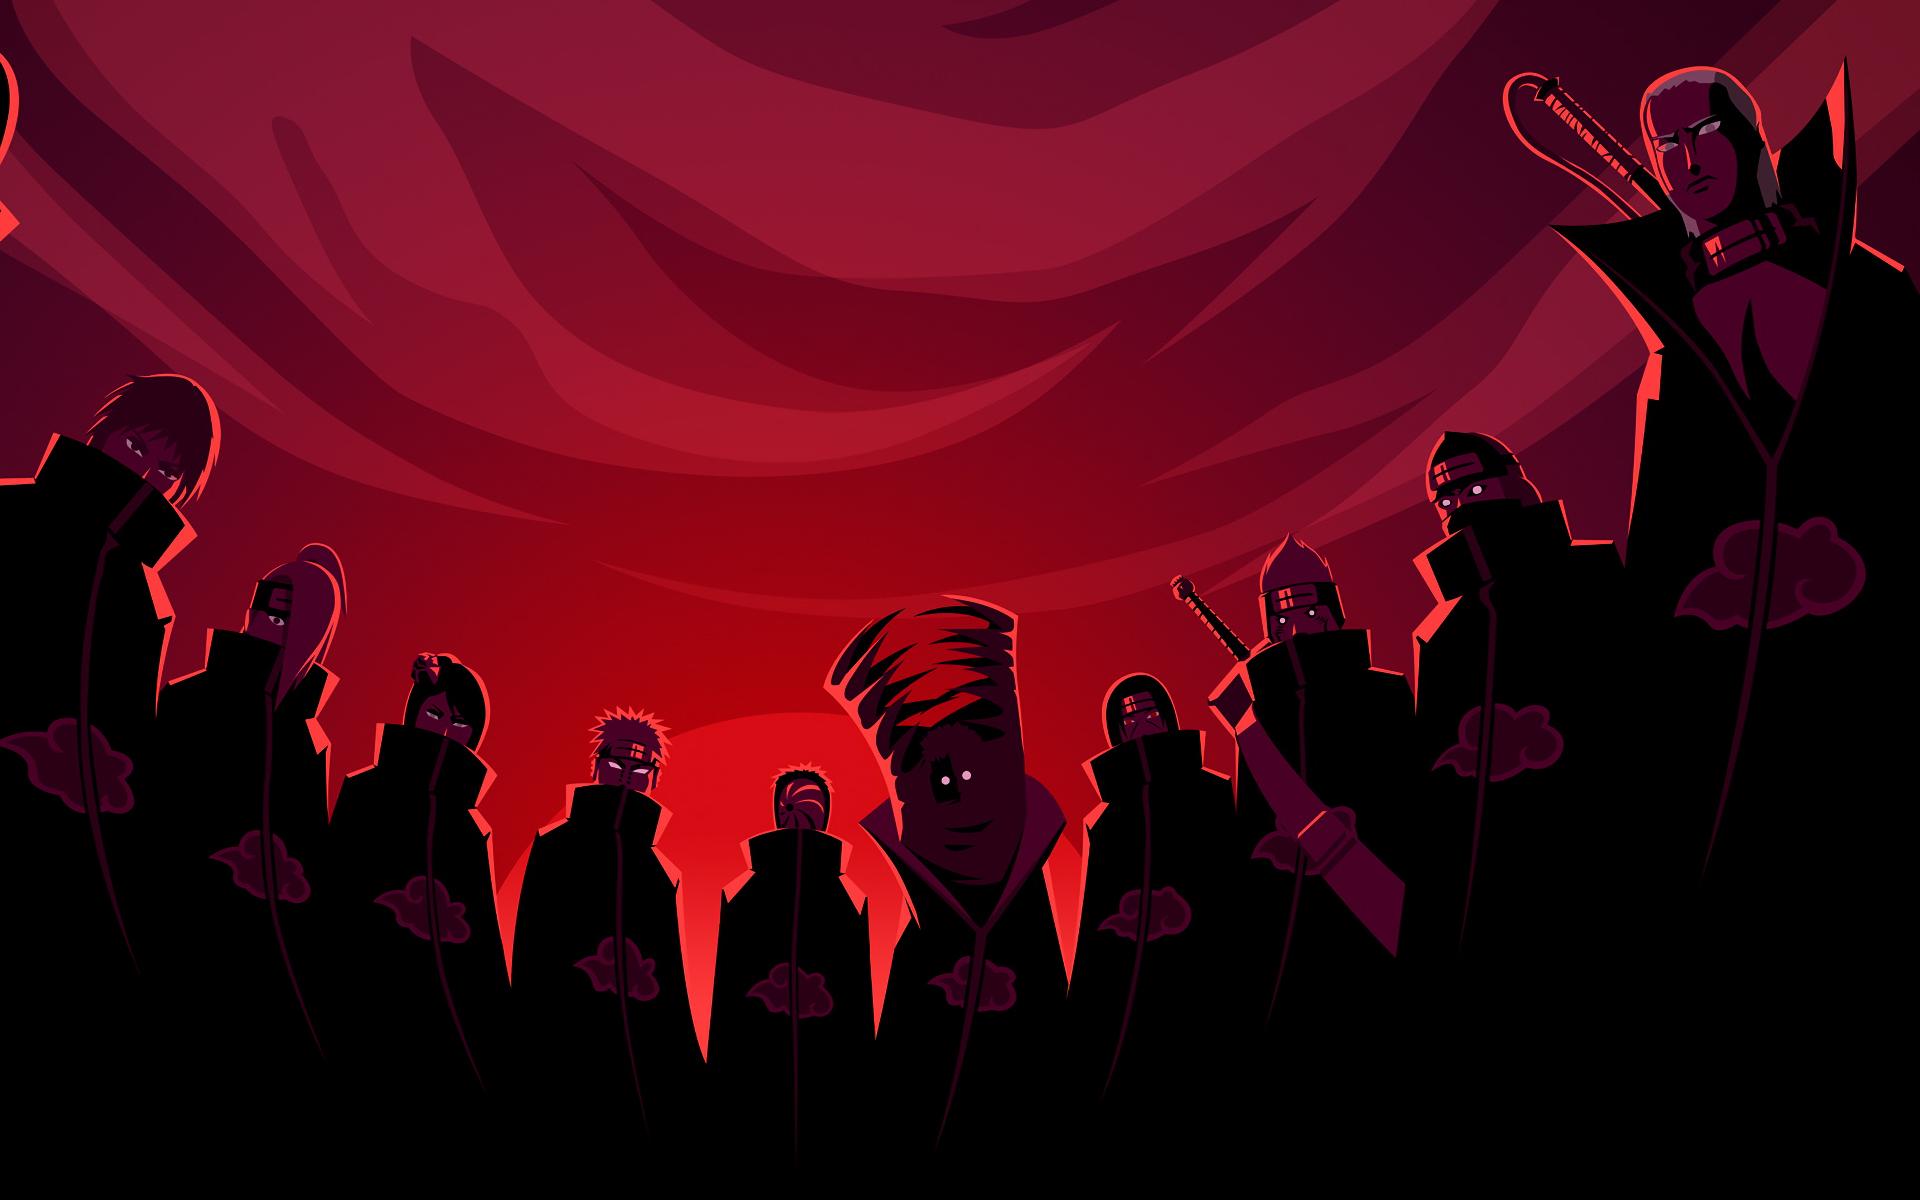 Naruto Wallpaper Hd 2016